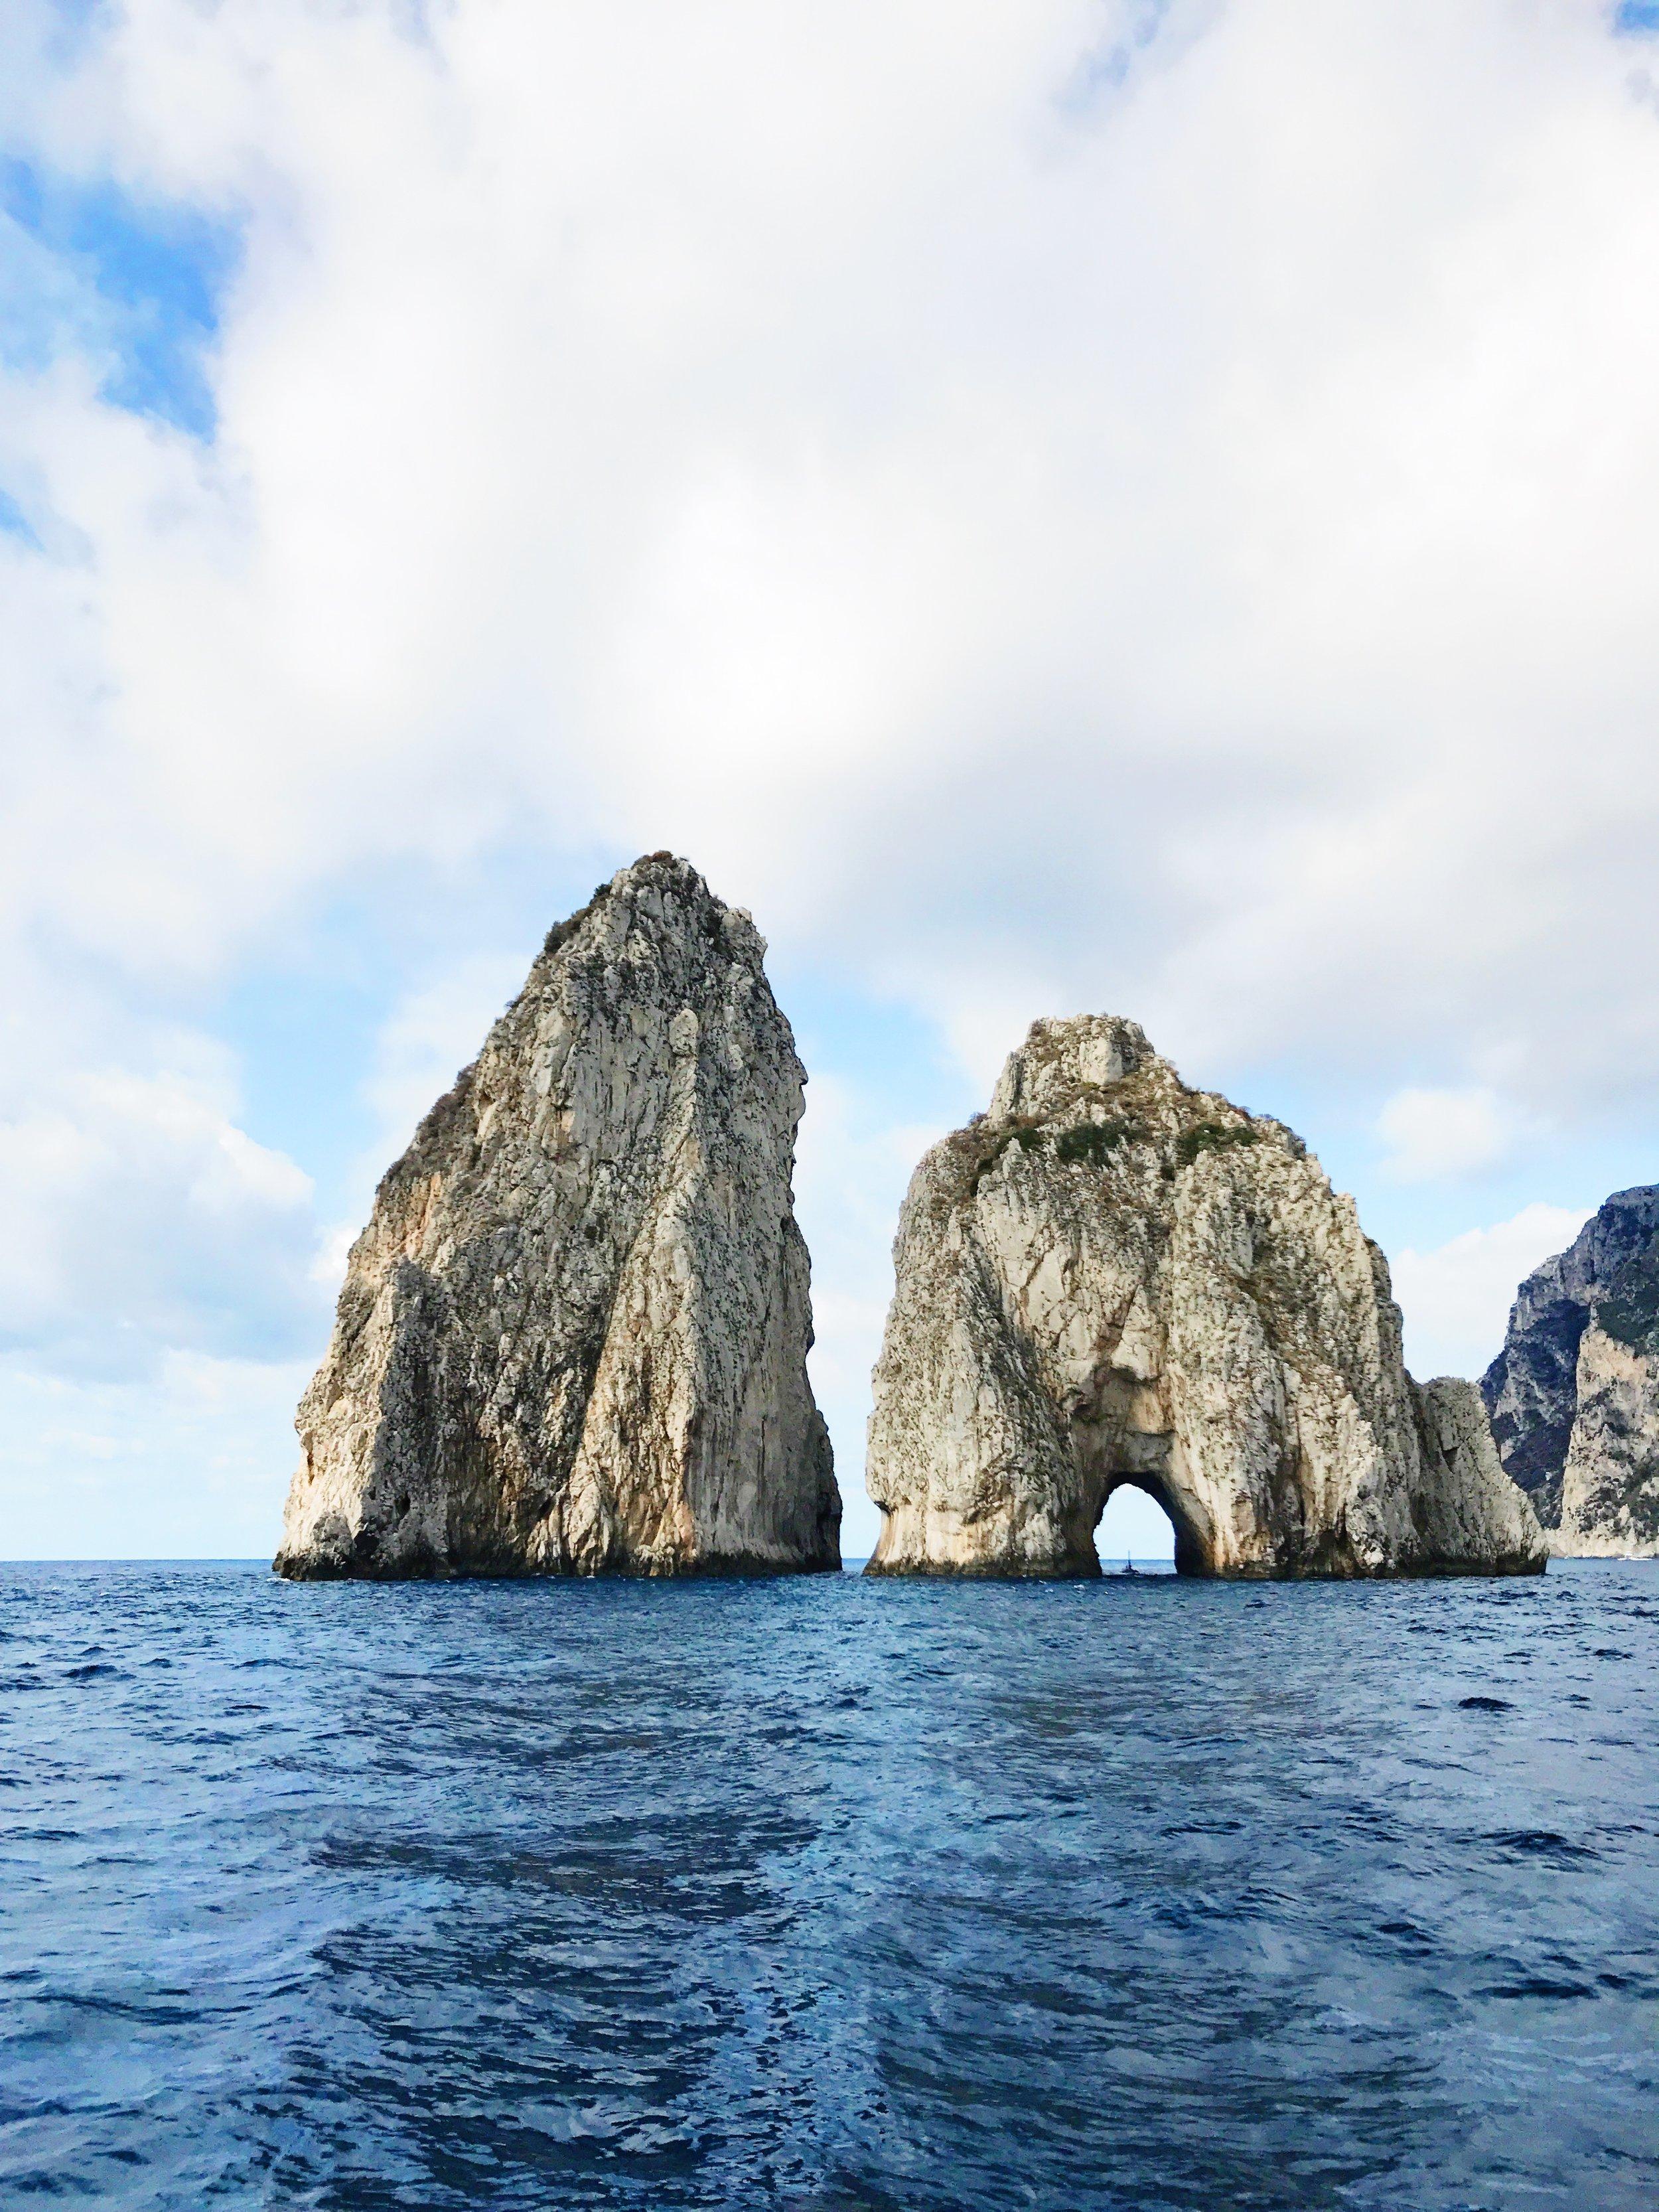 Capri_Italy_Faraglioni_Rocks.JPG